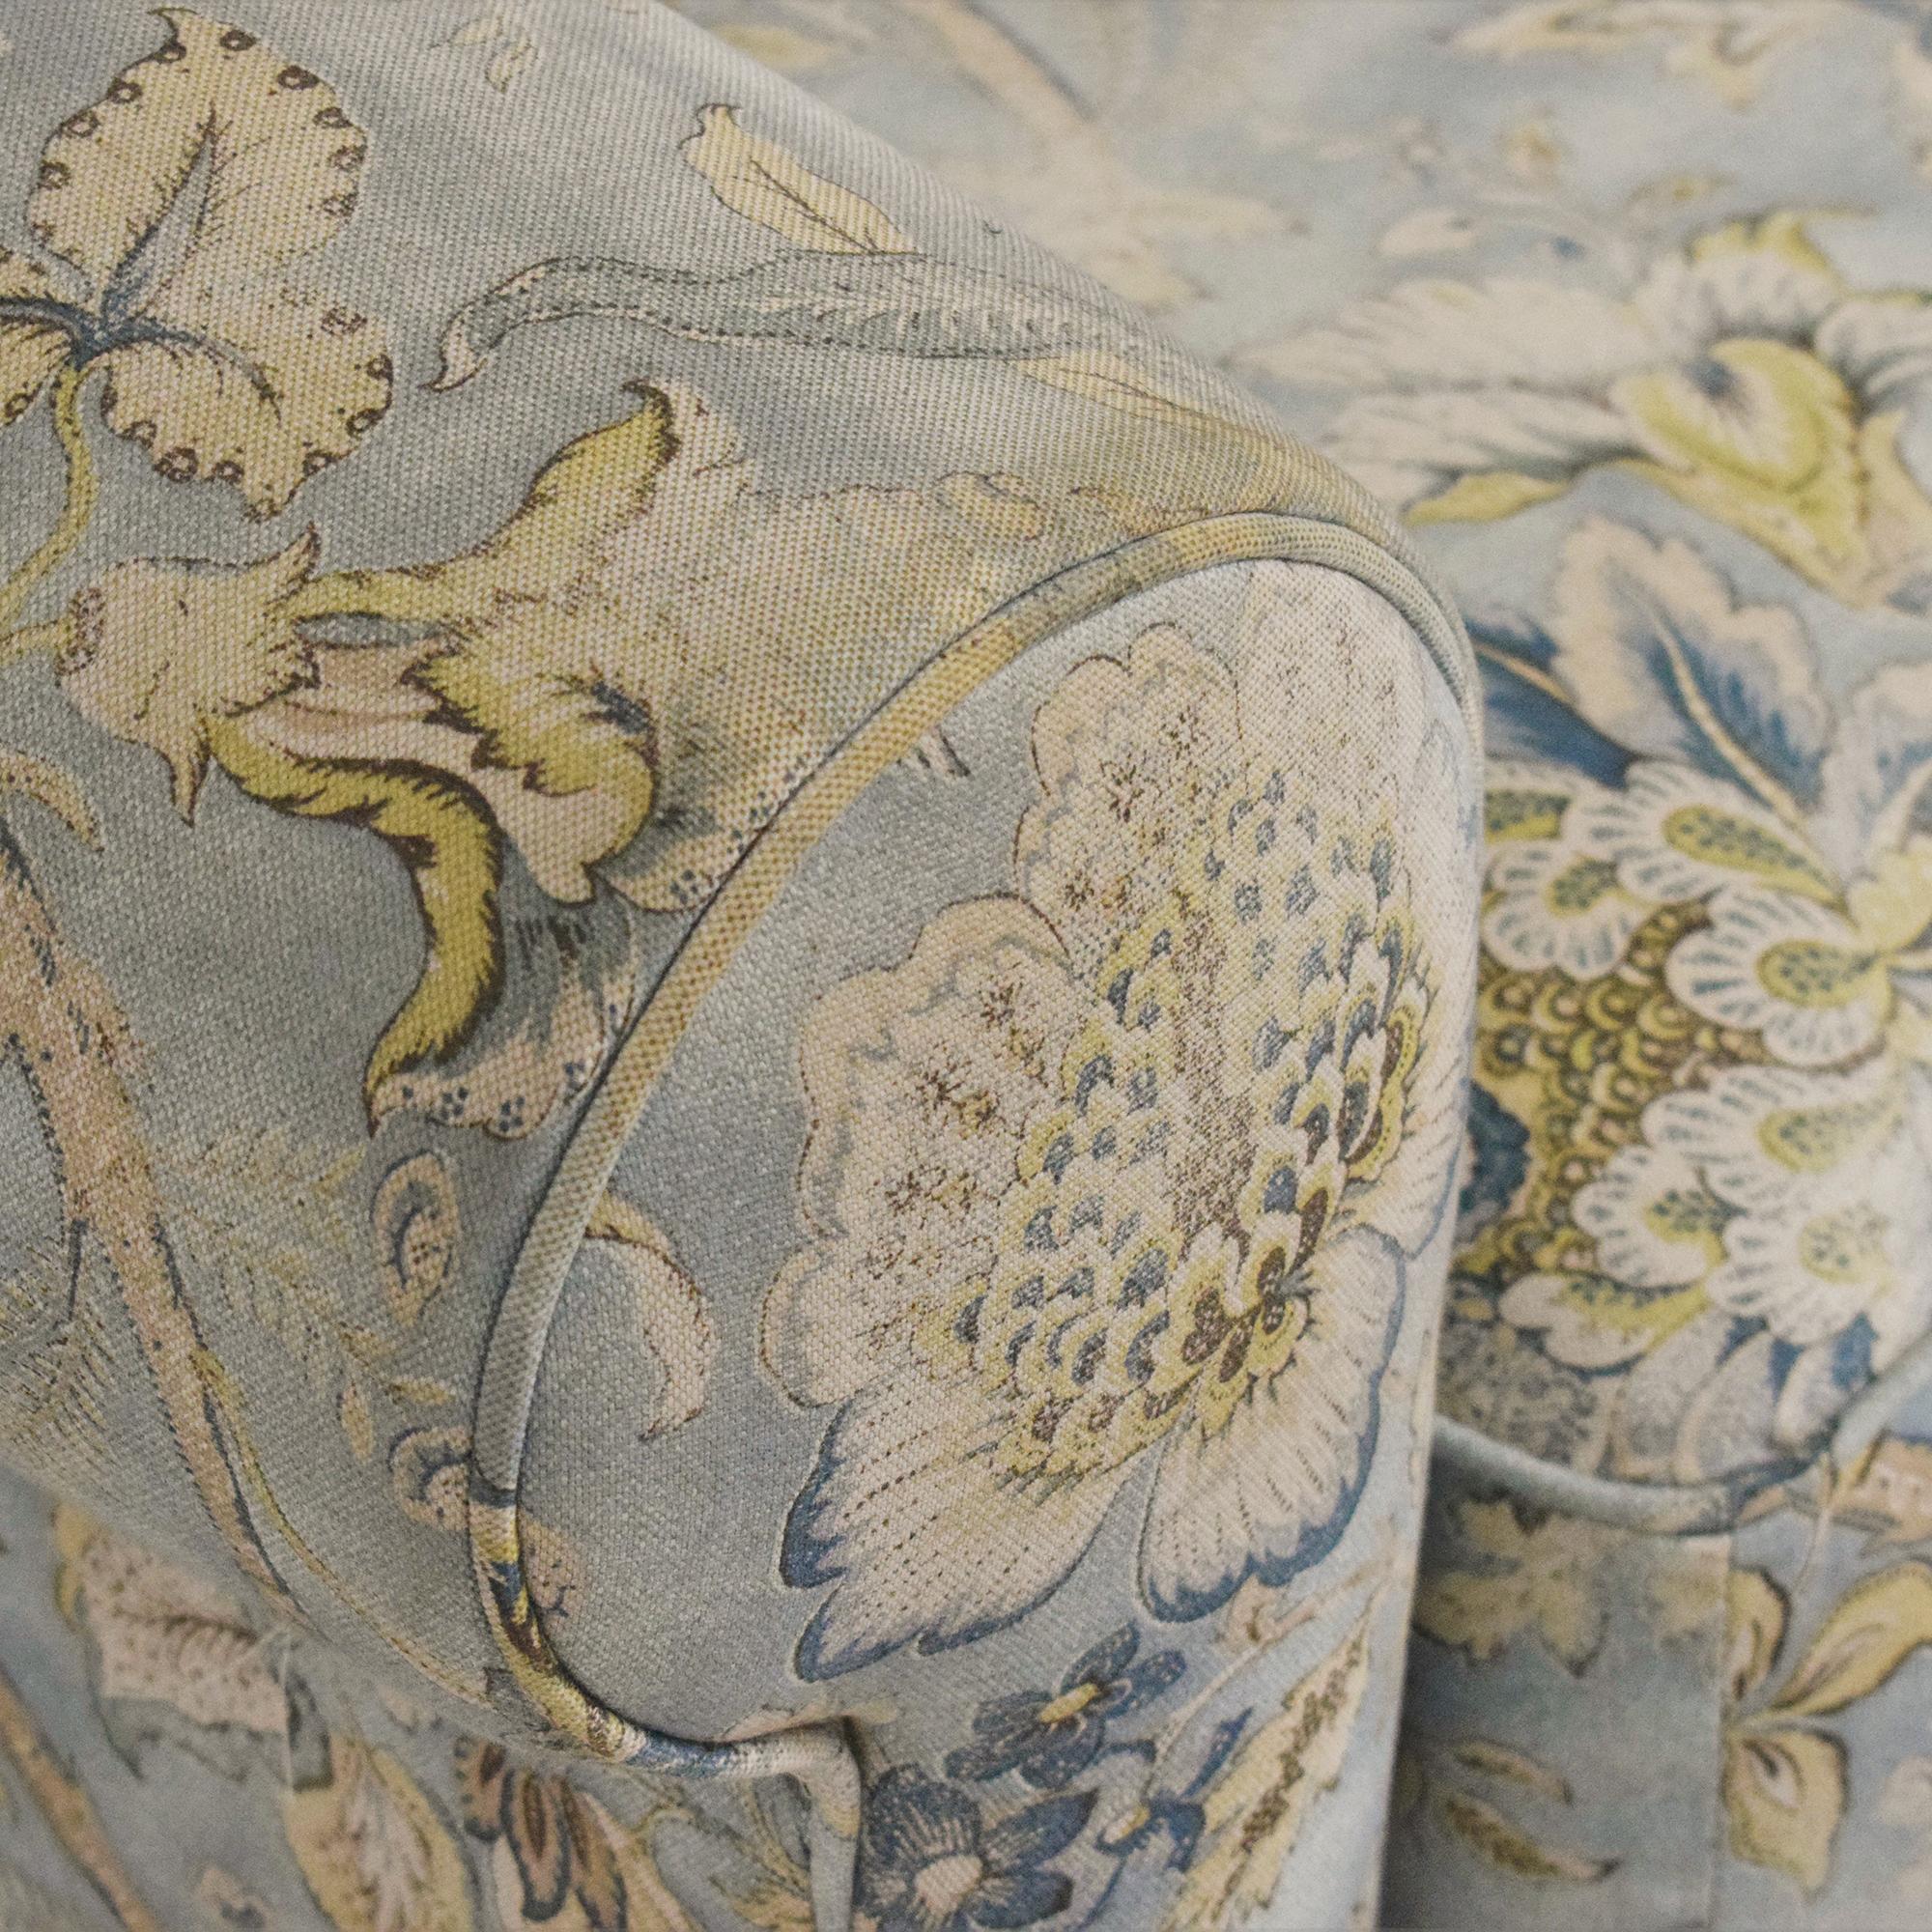 Arhaus Arhaus Baldwin Upholstered Swivel Chair with Ottoman discount